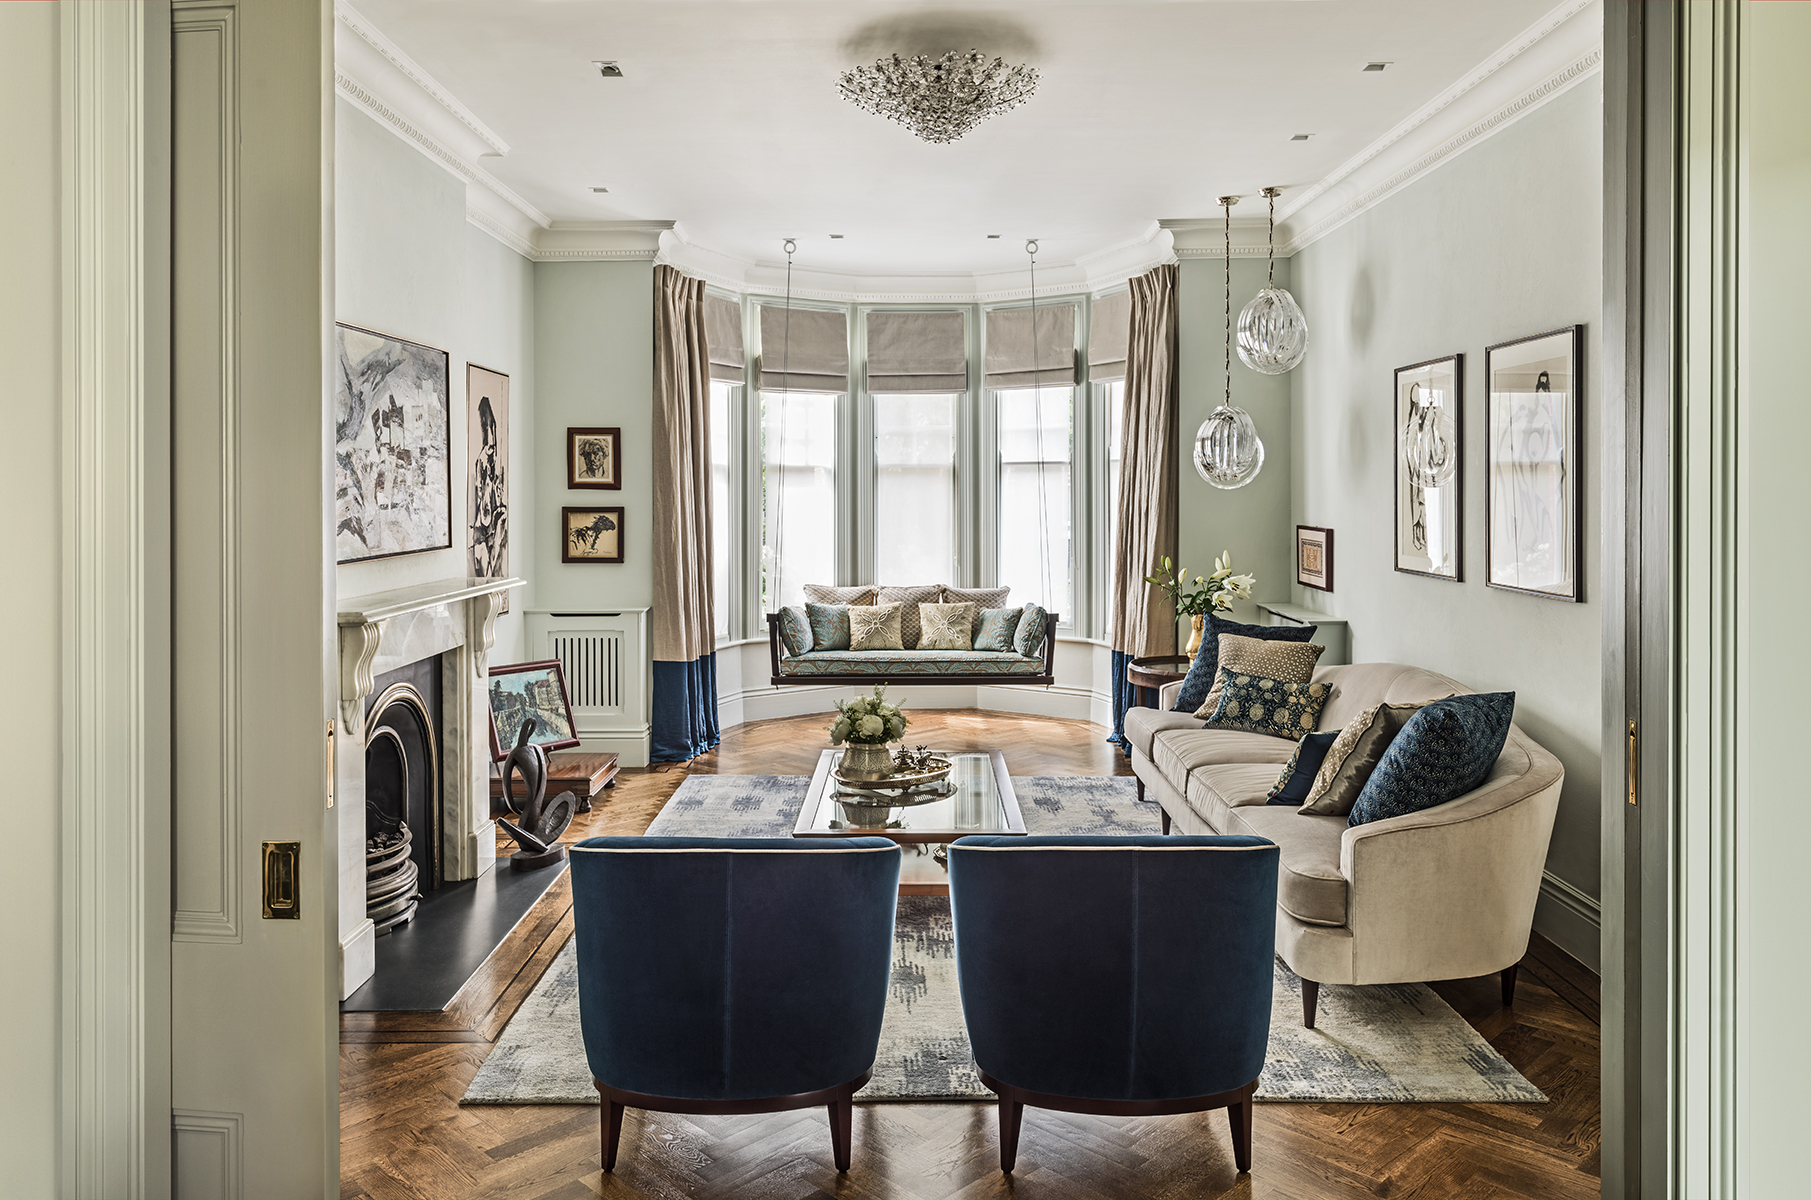 Top 12 interior design living room ideas from the best uk for Best british interior designers